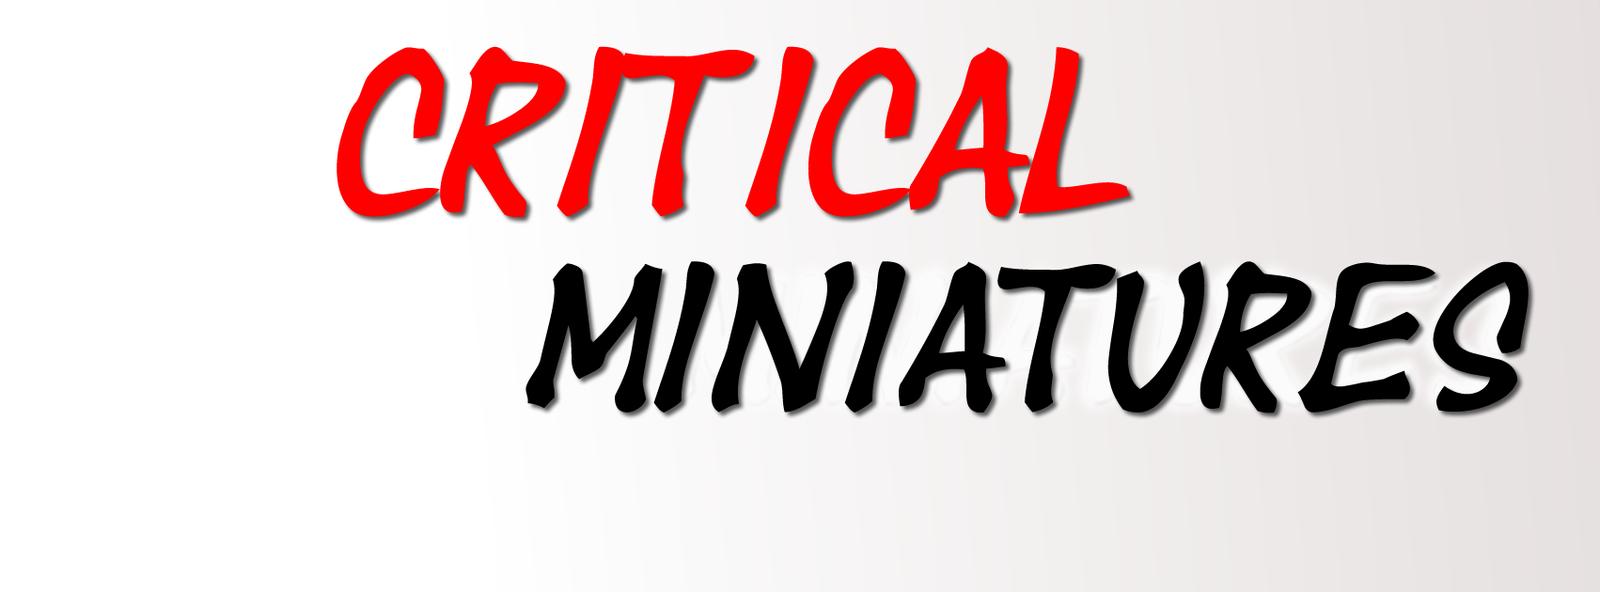 critical-miniatures